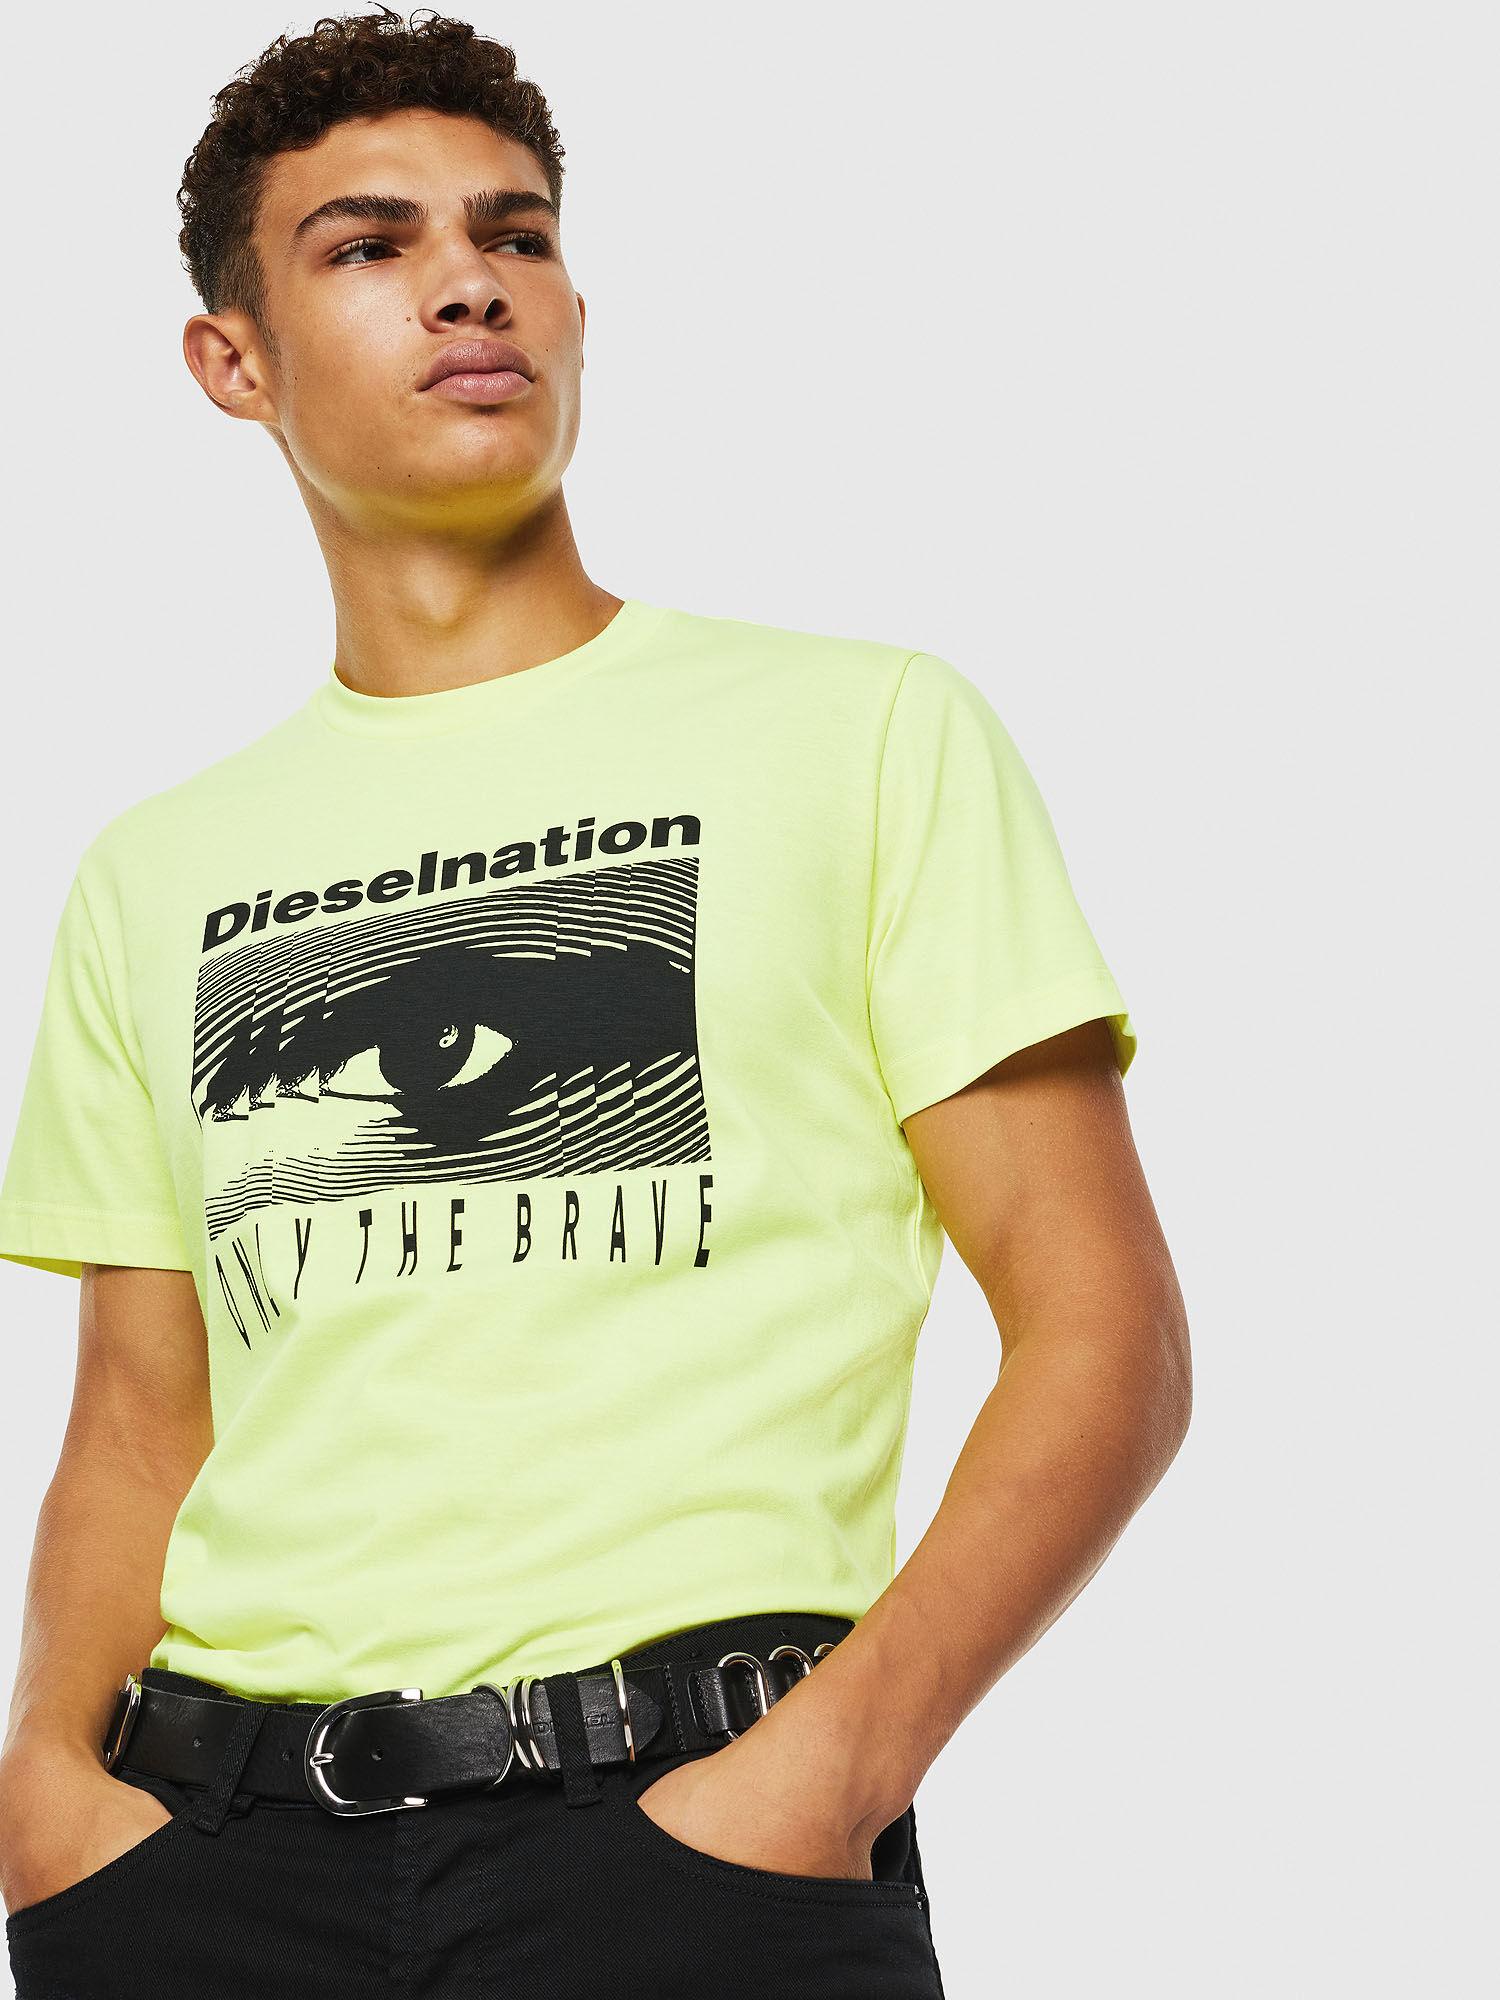 Columbia Men/'s 3-Pc Short Sleeve V-Neck Cotton T-Shirt